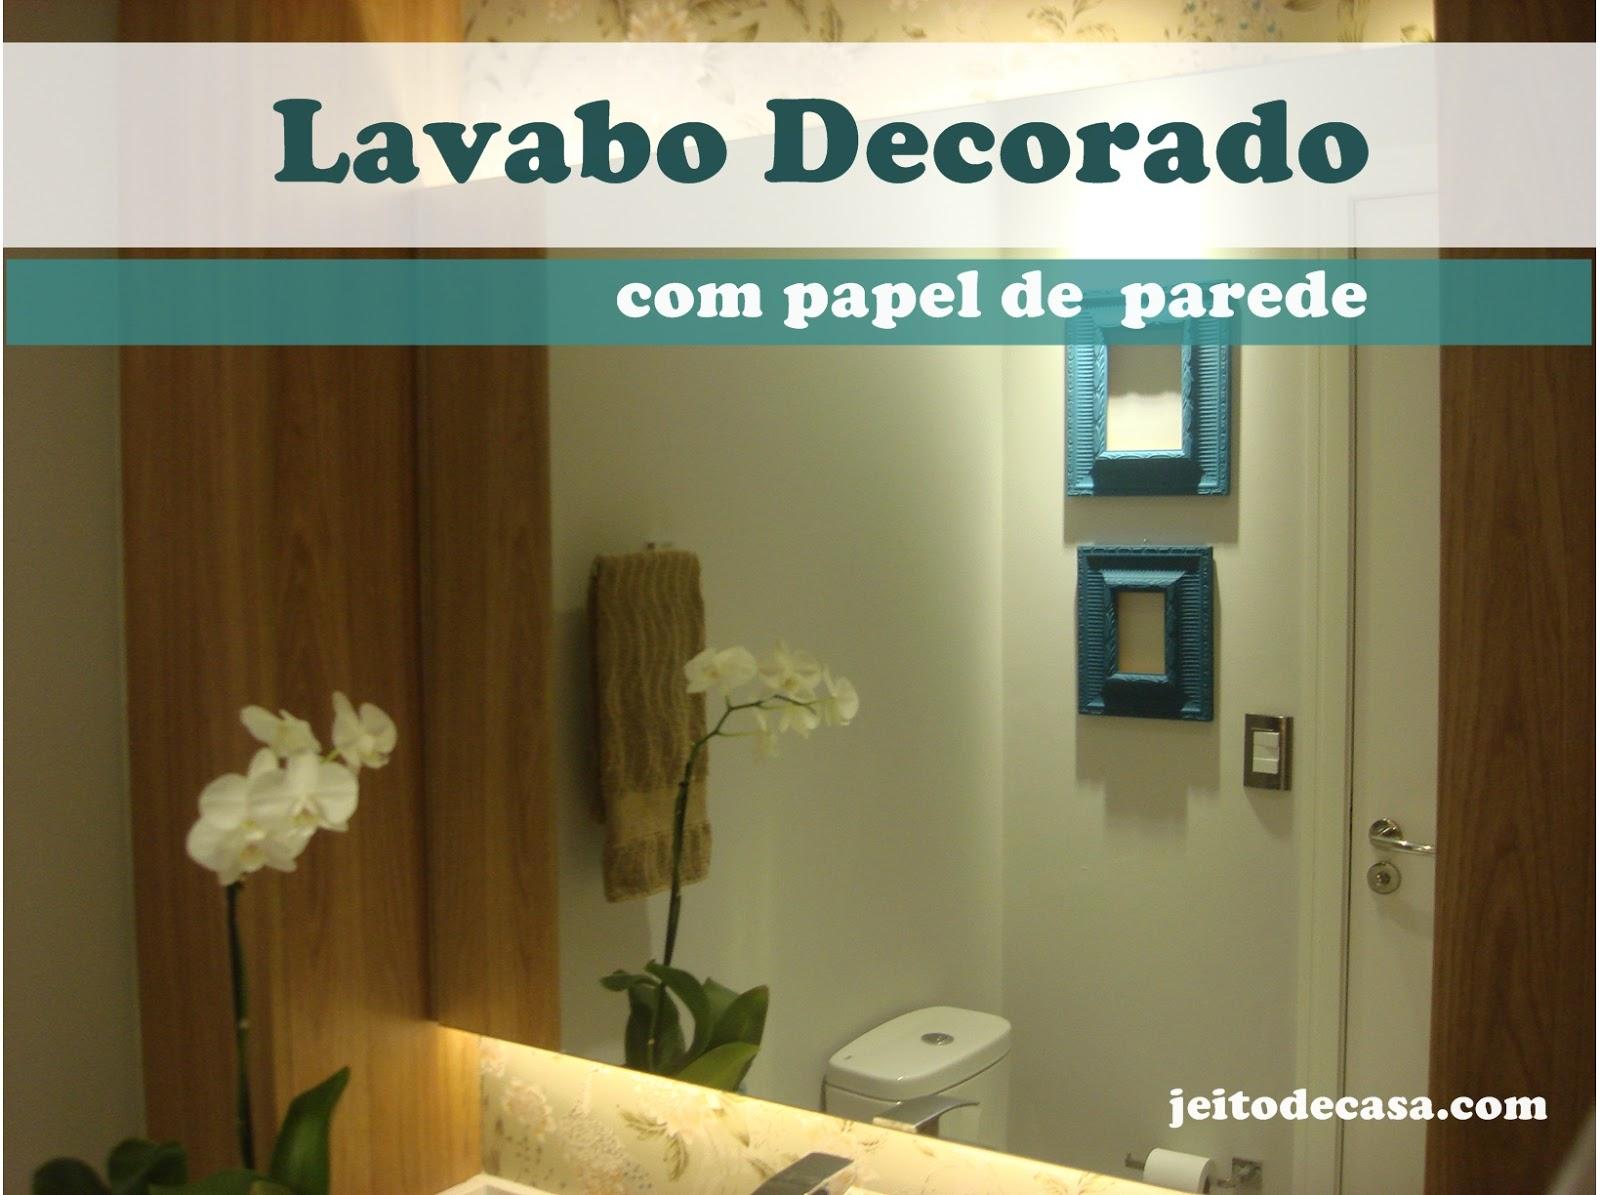 decoracao lavabo papel de parede:Lavabo decorado com papel de parede  #9B7430 1600 1195